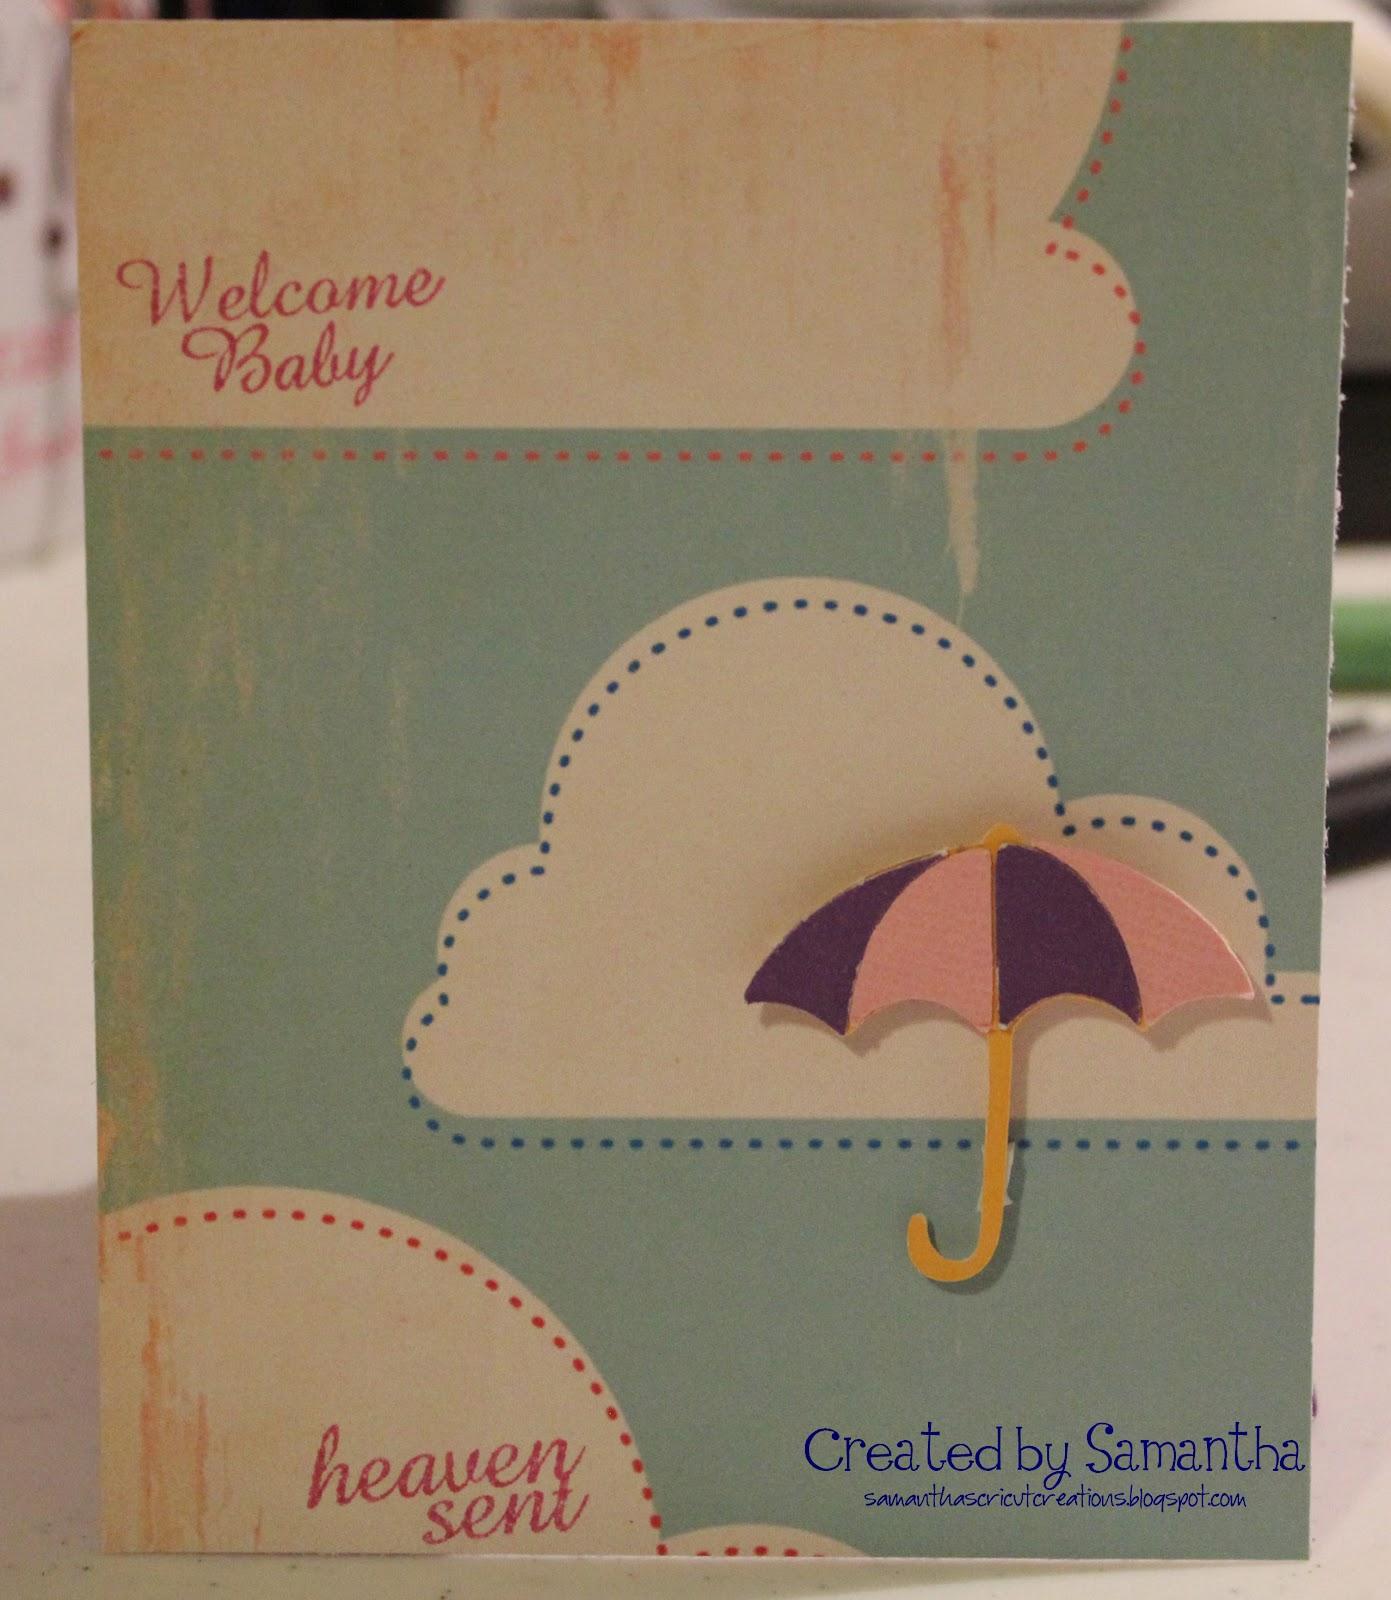 http://1.bp.blogspot.com/-t4w1xnZvipY/UEF3TM7F_nI/AAAAAAAABvQ/B9wUqFn3uLg/s1600/Watermarked+-+Umbrella+shower+invite+001.jpg